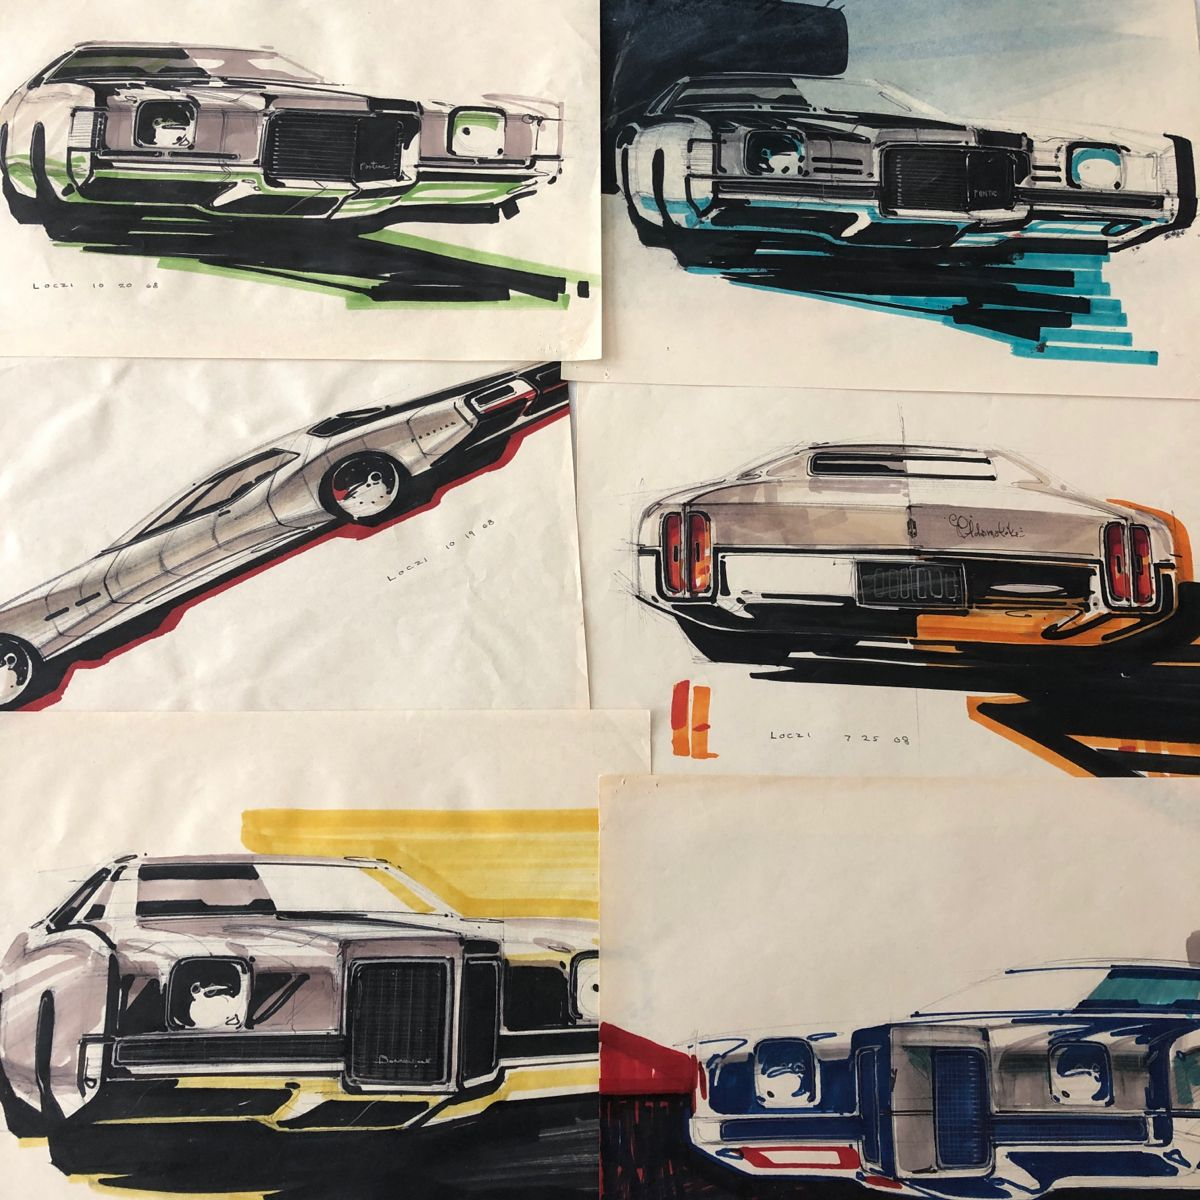 Original late 1960s car design renderings by notable car designer Geza Loczi. Very rare authentic art pieces #cardesign #cardesignworld #cardesignworld #vintage #oldsmobile #pontiac #Automobilia #Vintagecars #giftsforhim #Giftsfordad #Wallart #mancavegarage  #cardesigndaily